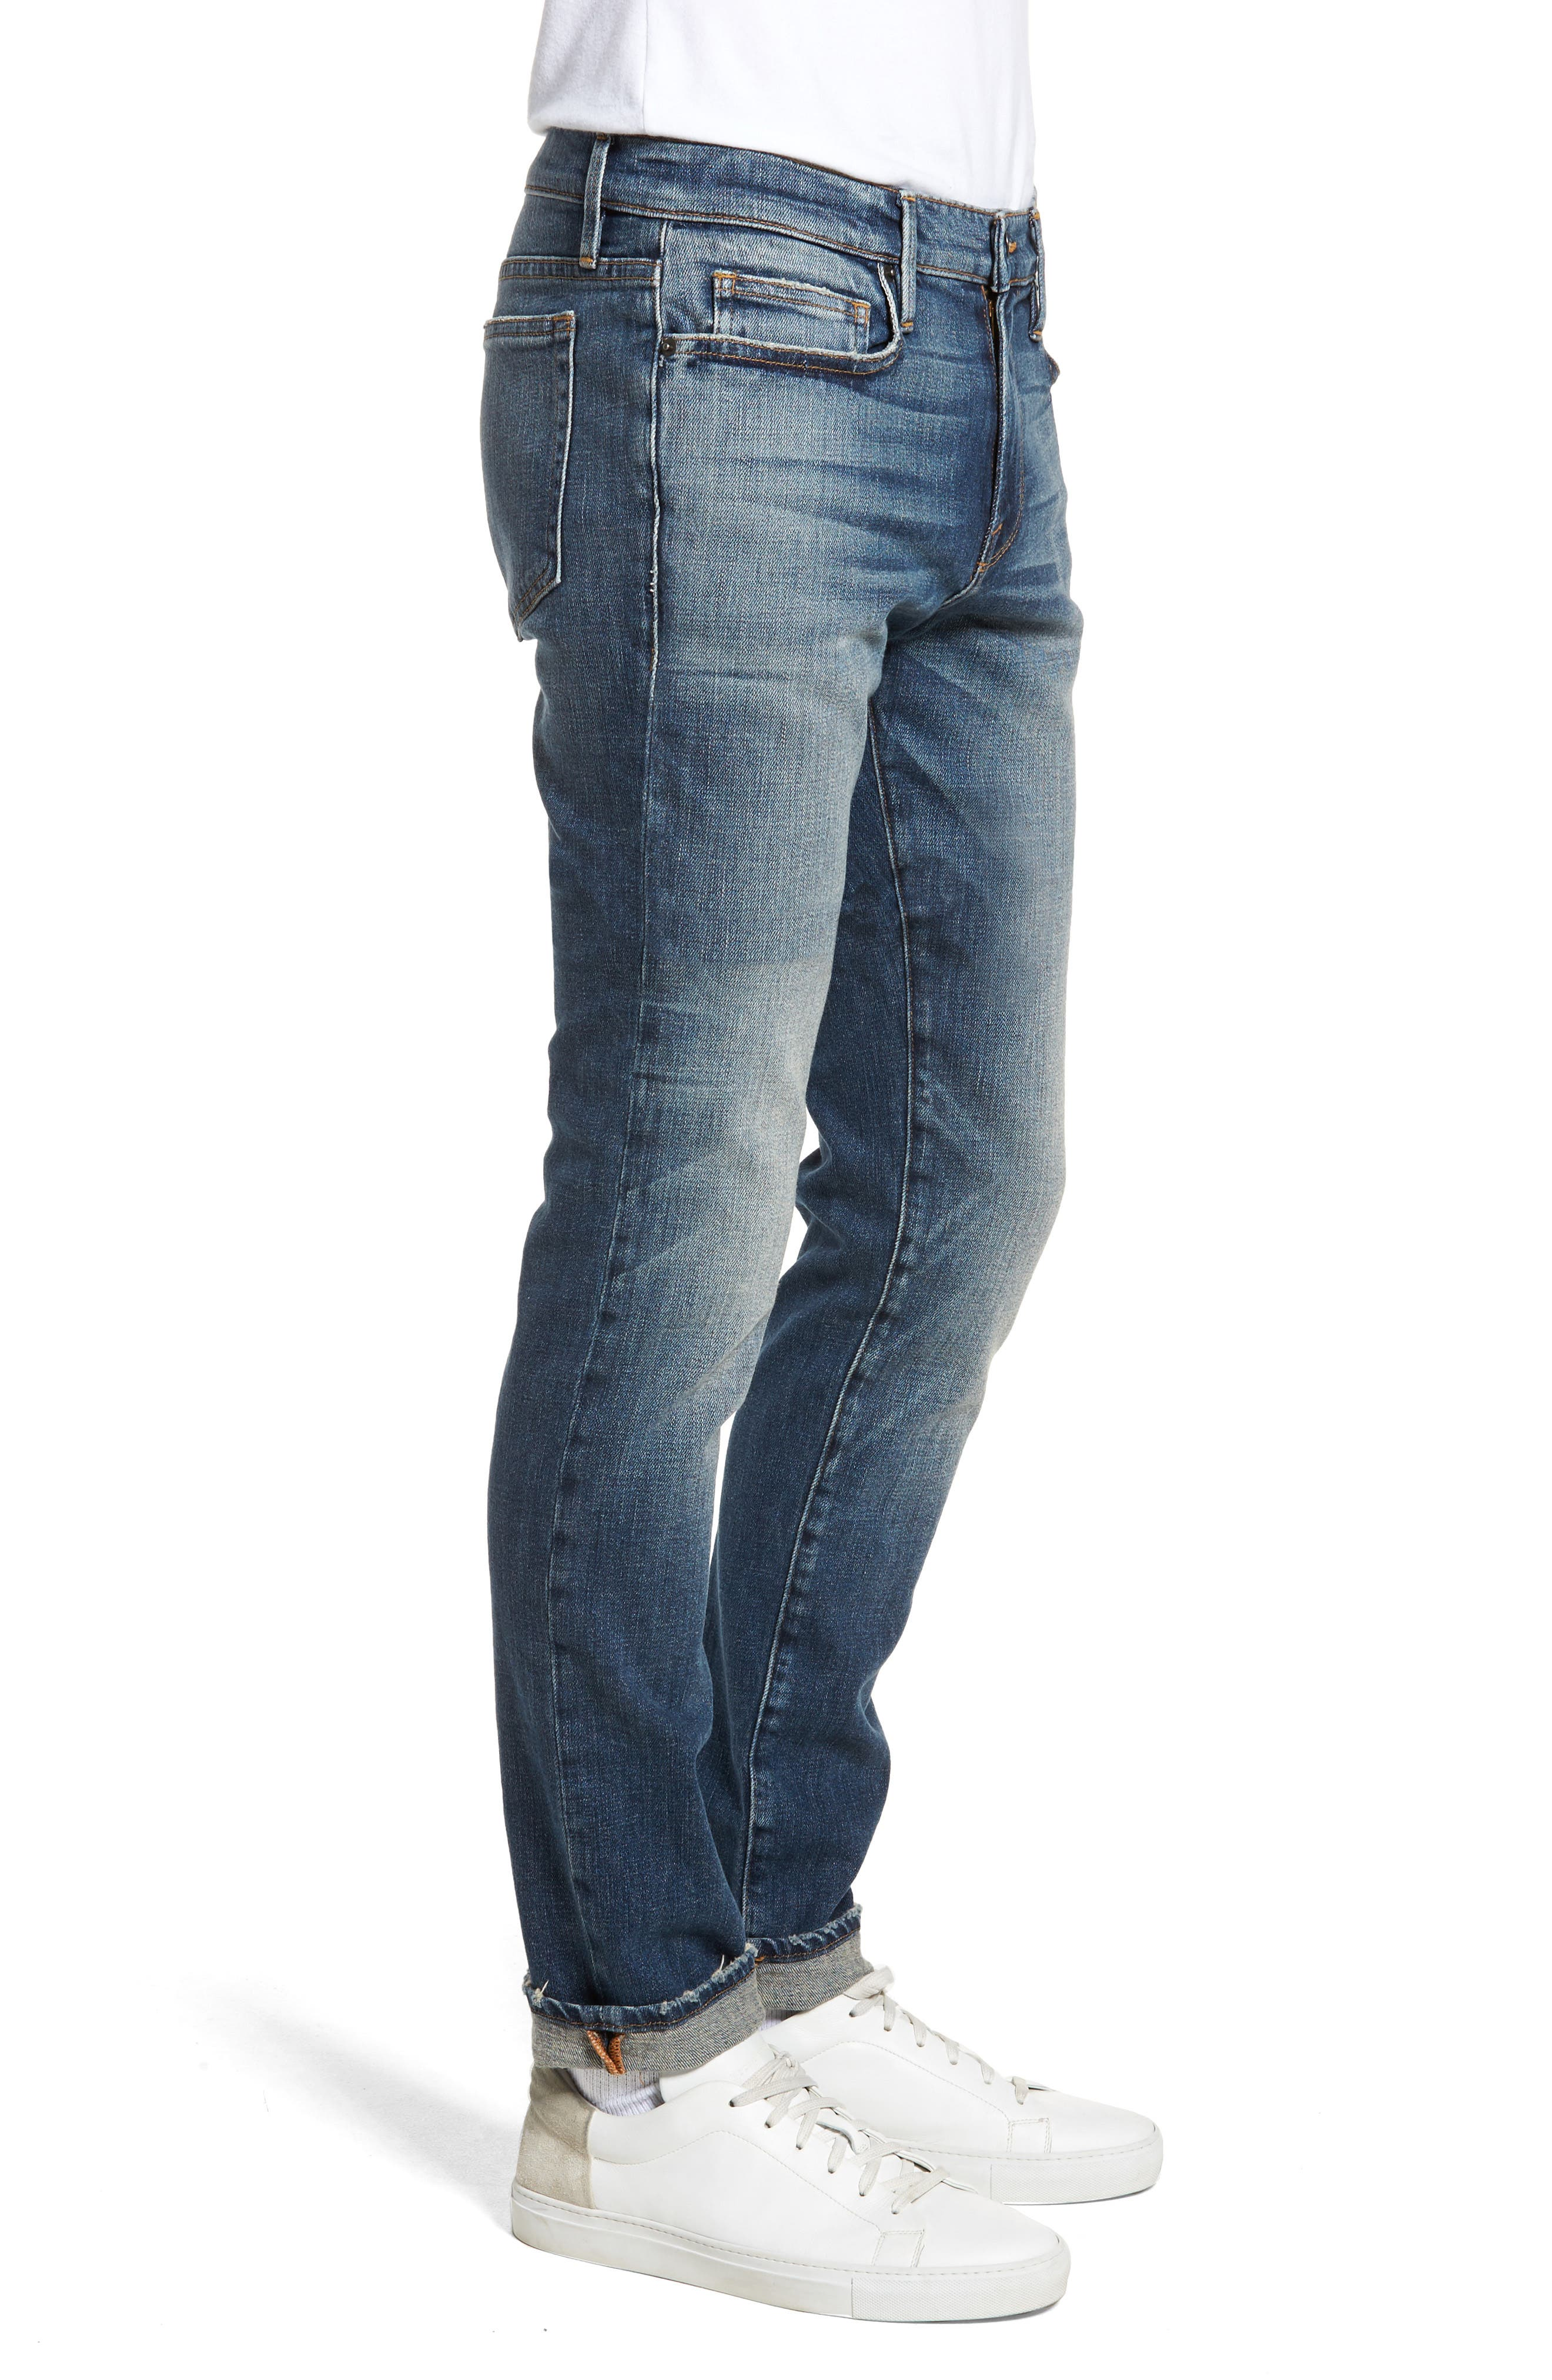 L'Homme Skinny Fit Jeans,                             Alternate thumbnail 3, color,                             405